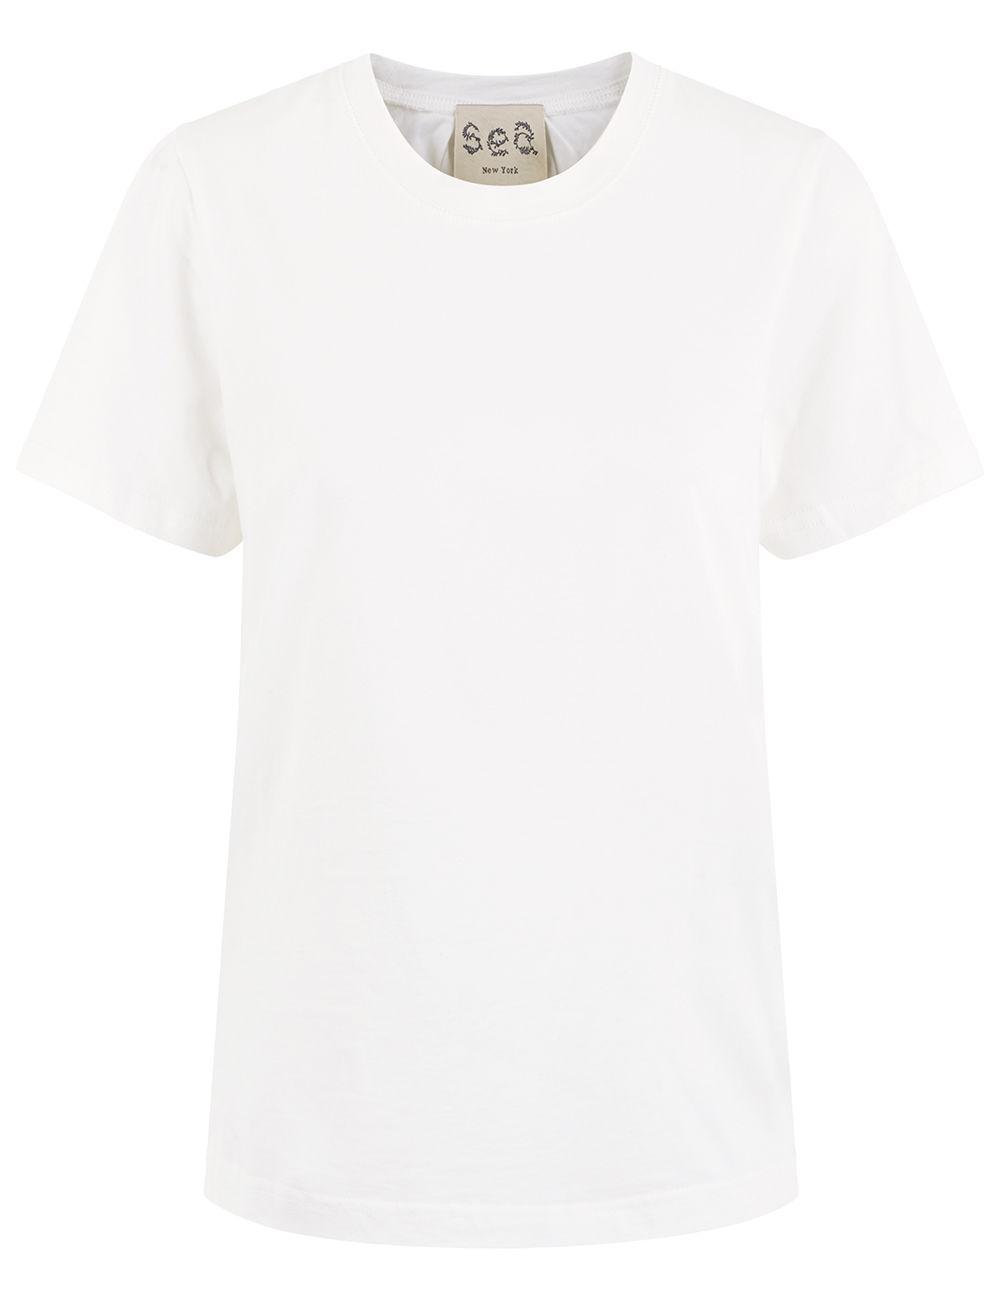 White T Shirt  Artee Shirt